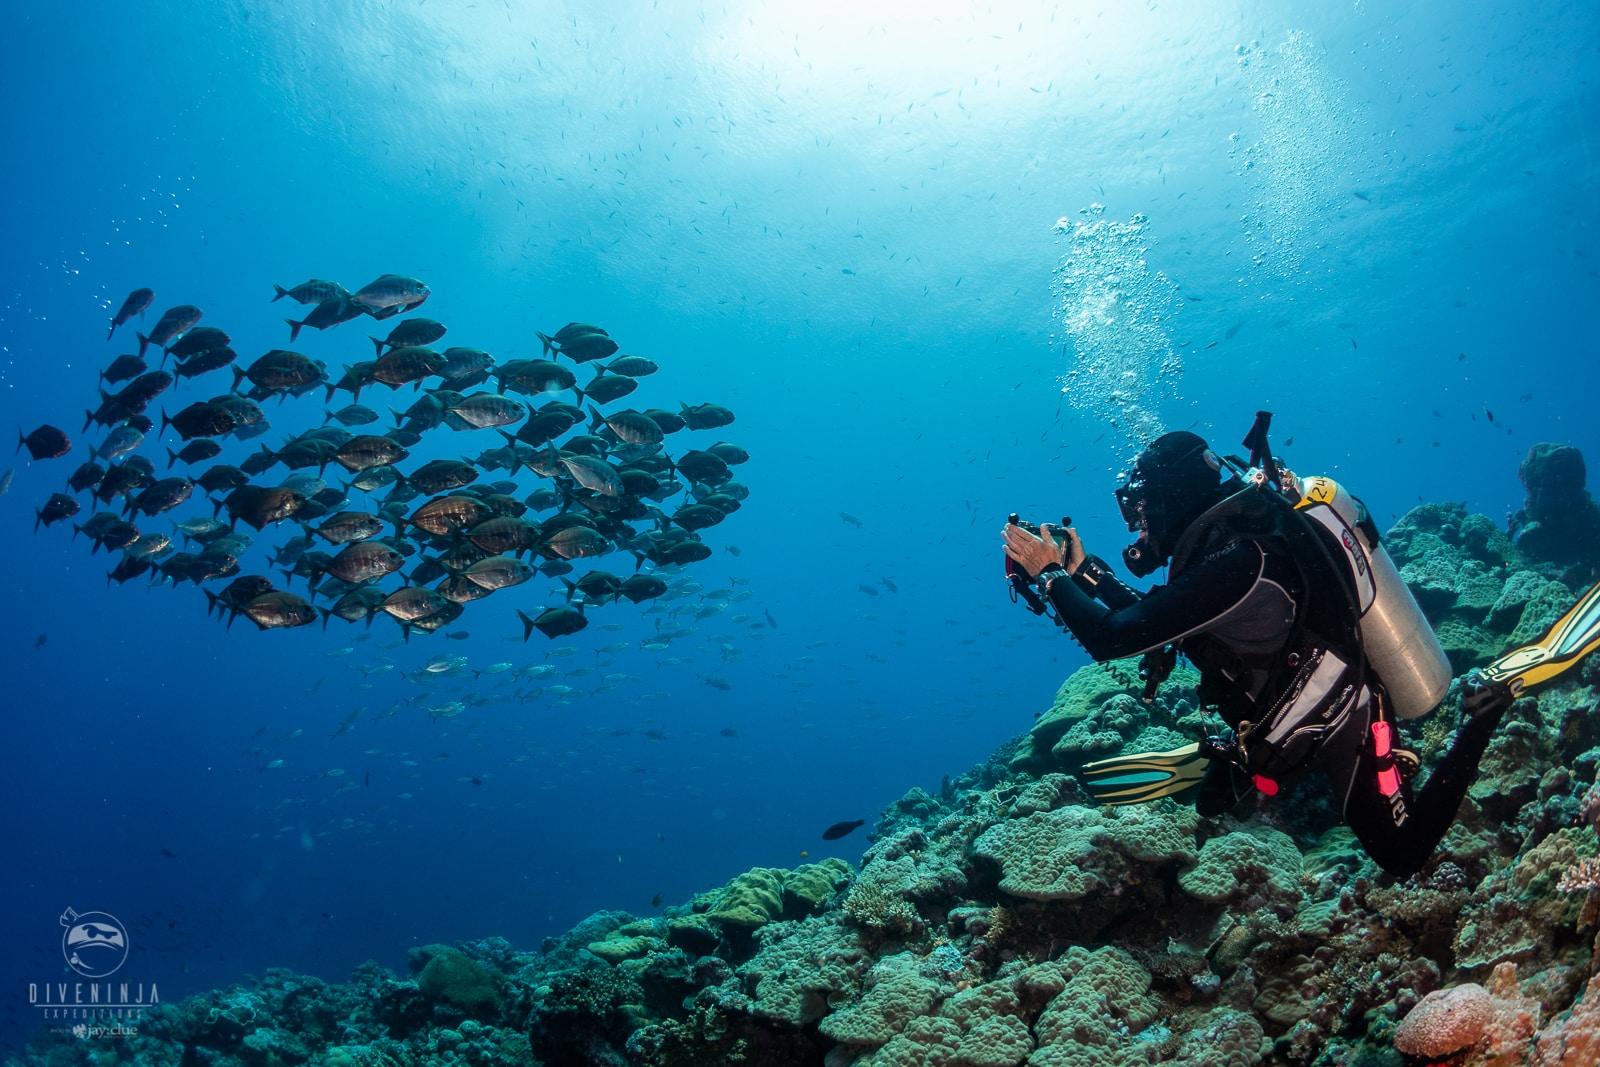 scuba diver taking photo of fish